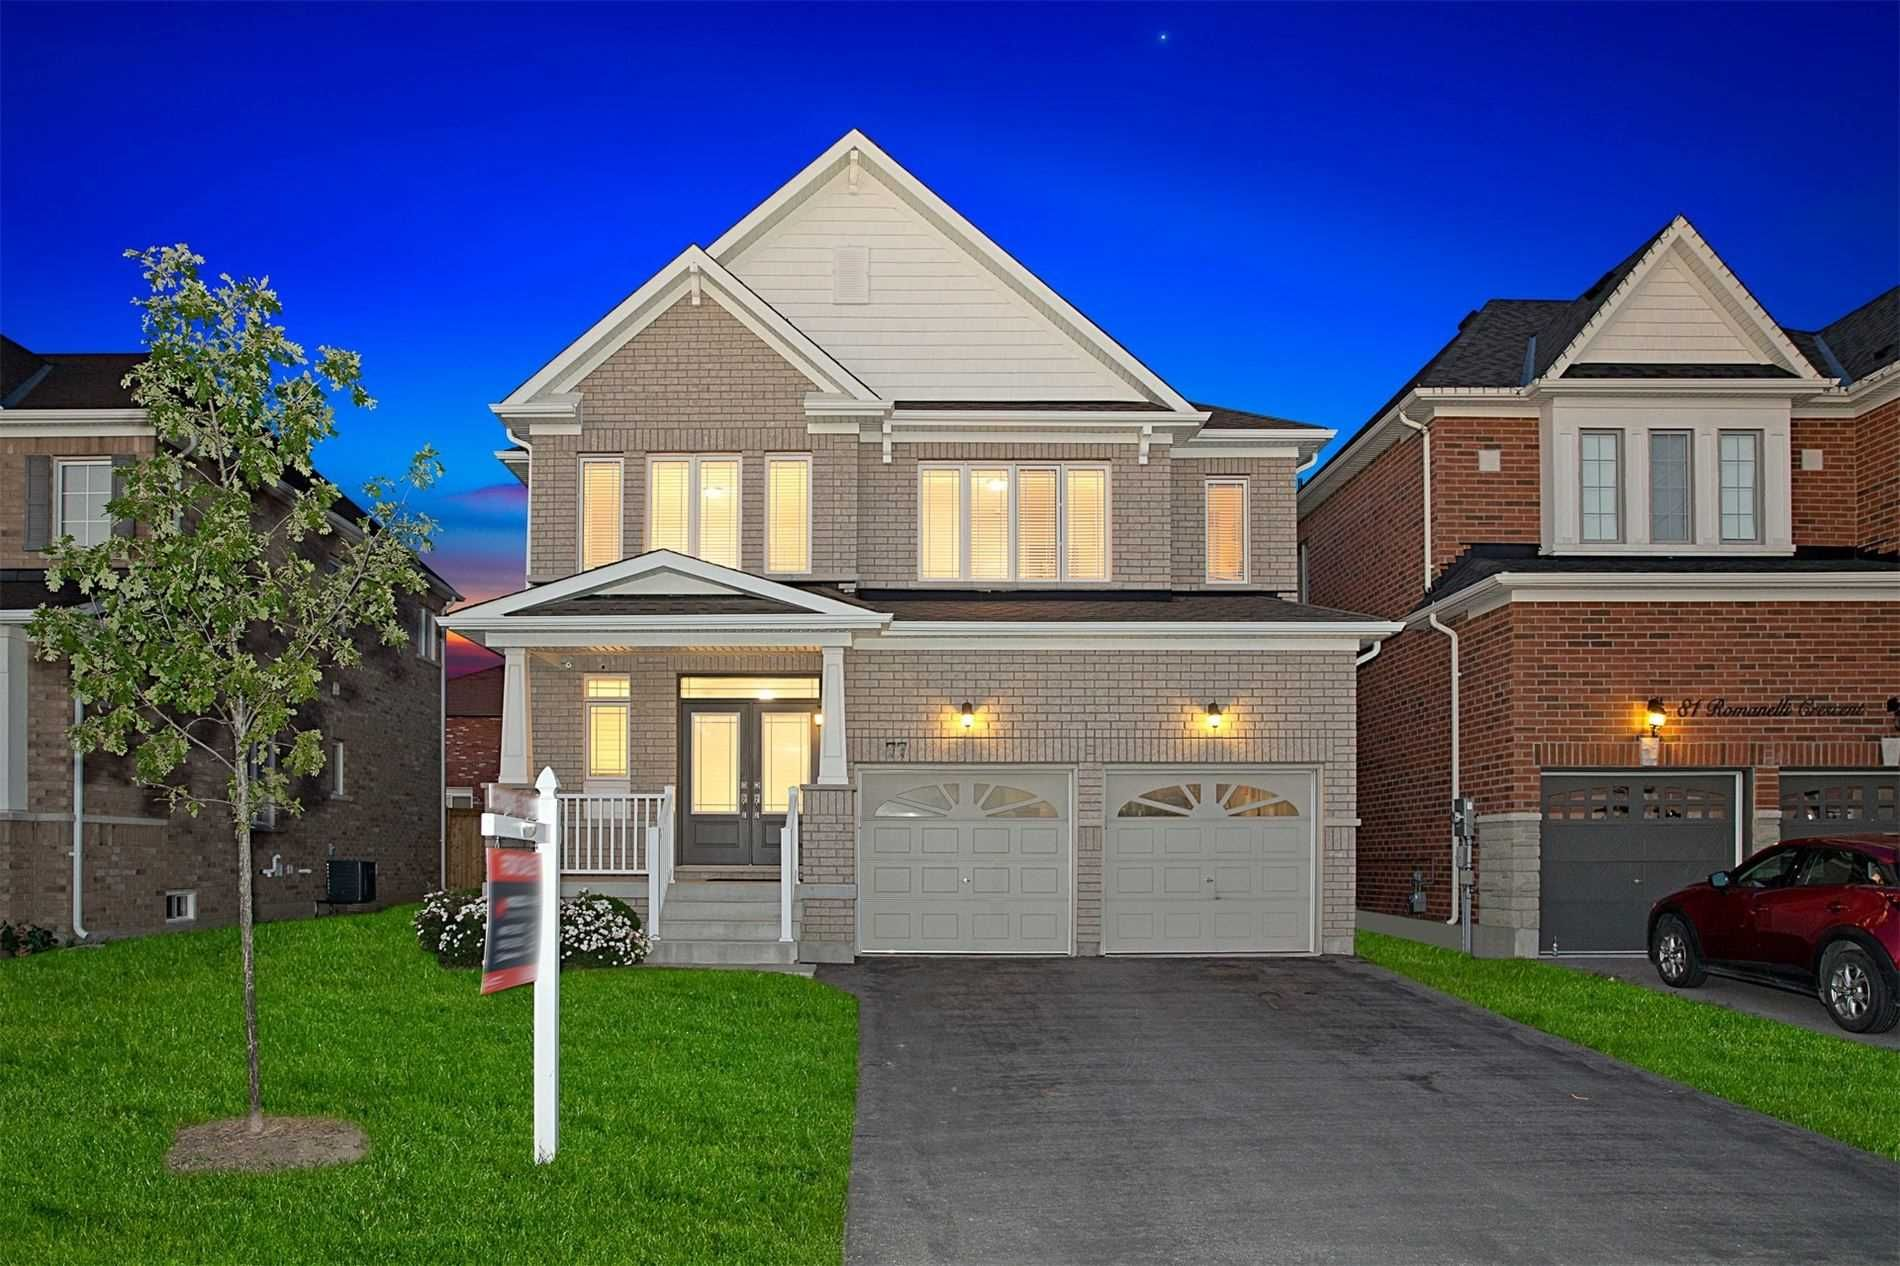 Main Photo: 77 Romanelli Crescent in Bradford West Gwillimbury: Bradford House (2-Storey) for sale : MLS®# N5347505